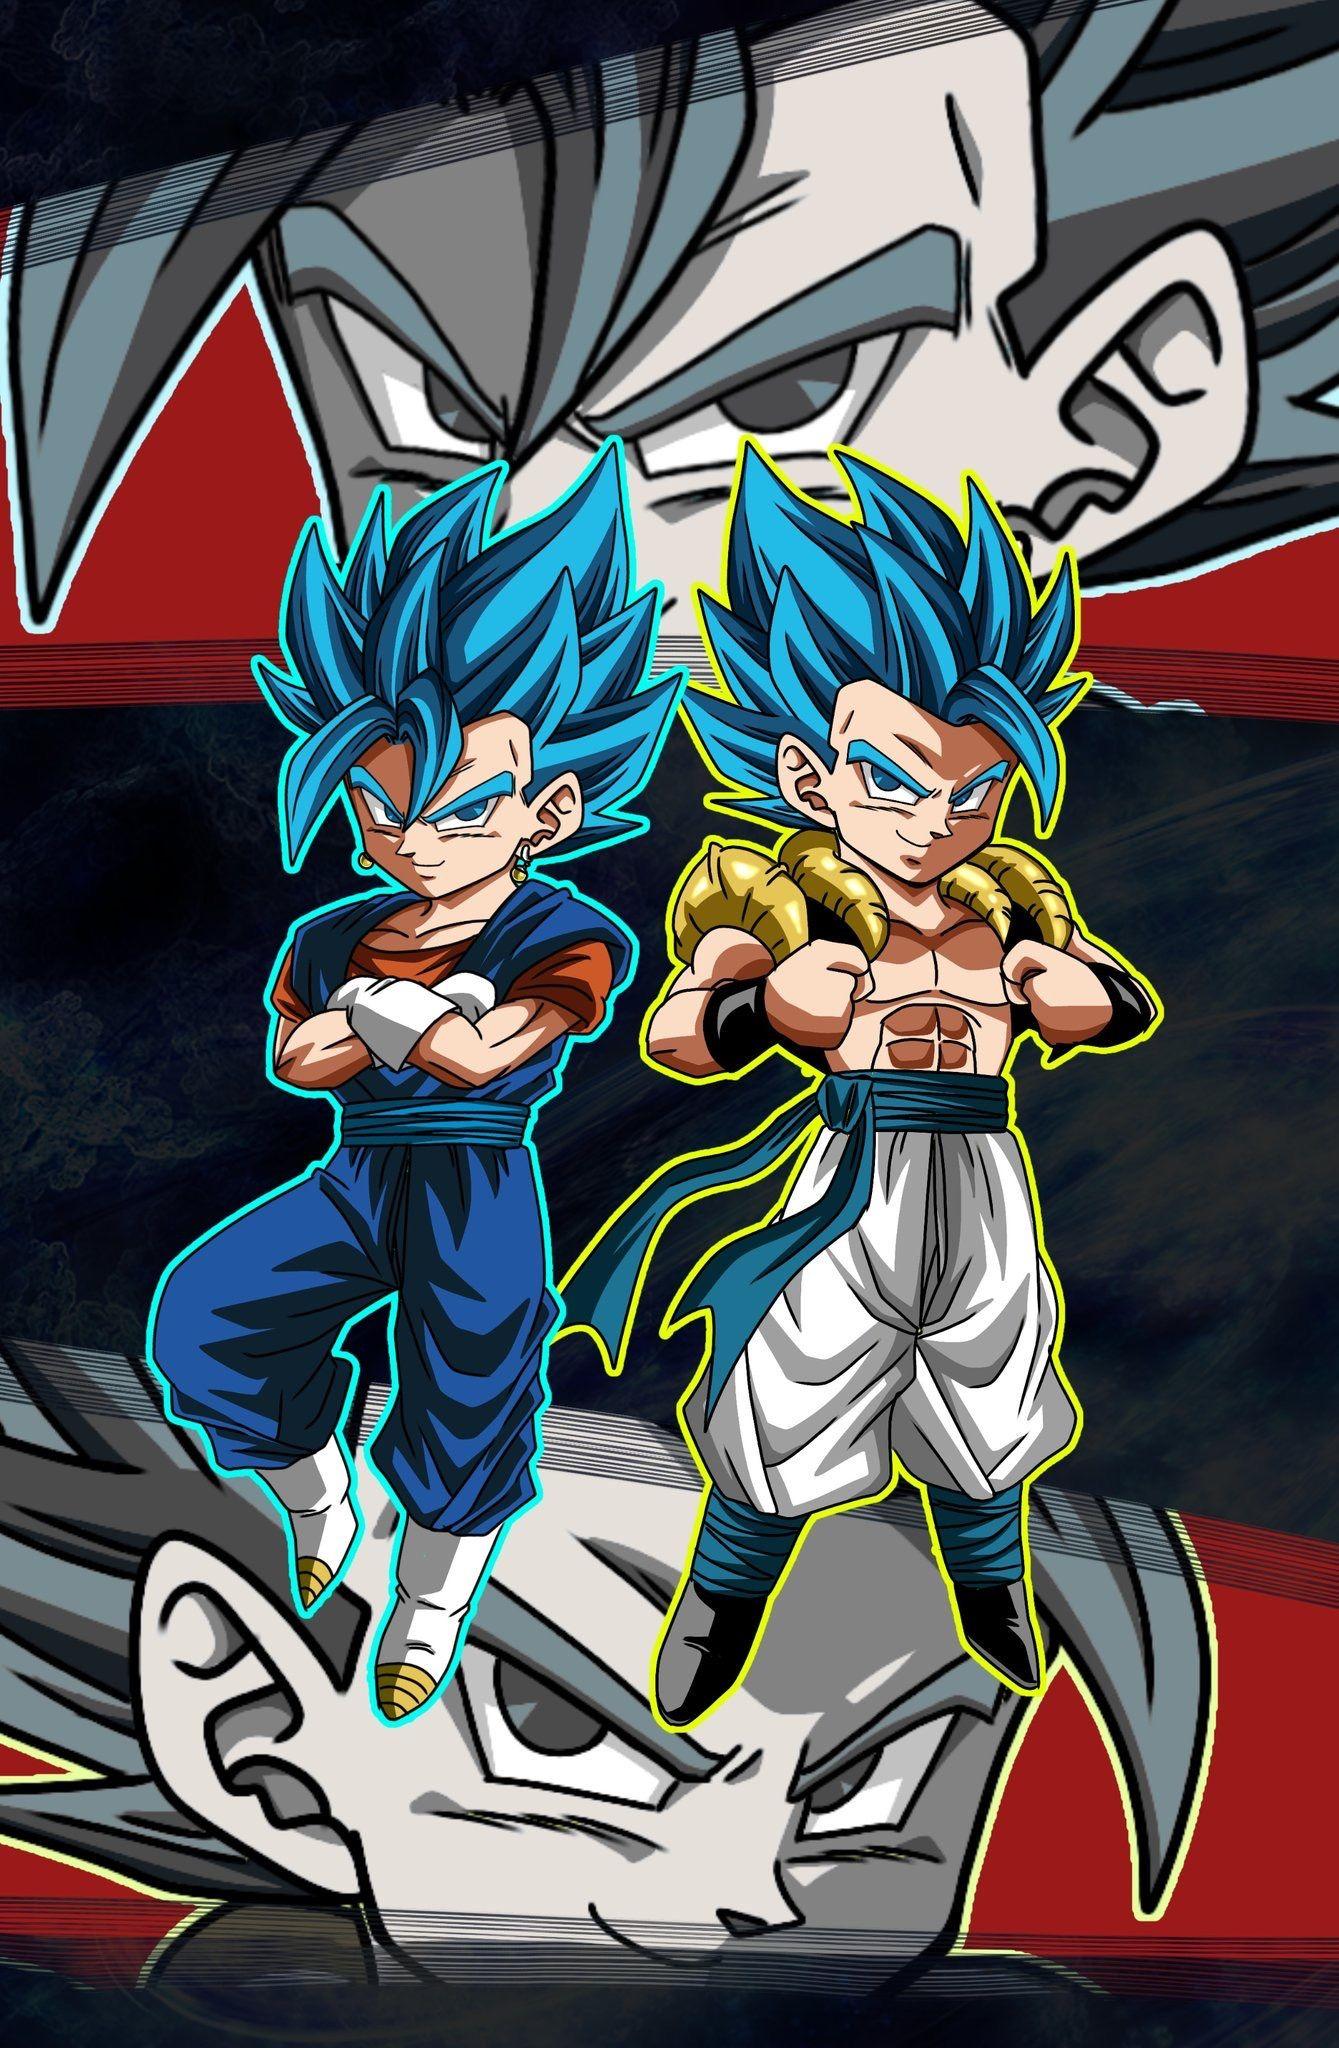 Goku Wallpaper Iphone 7 Goku Wallpaper Dragon Ball Dragon Ball